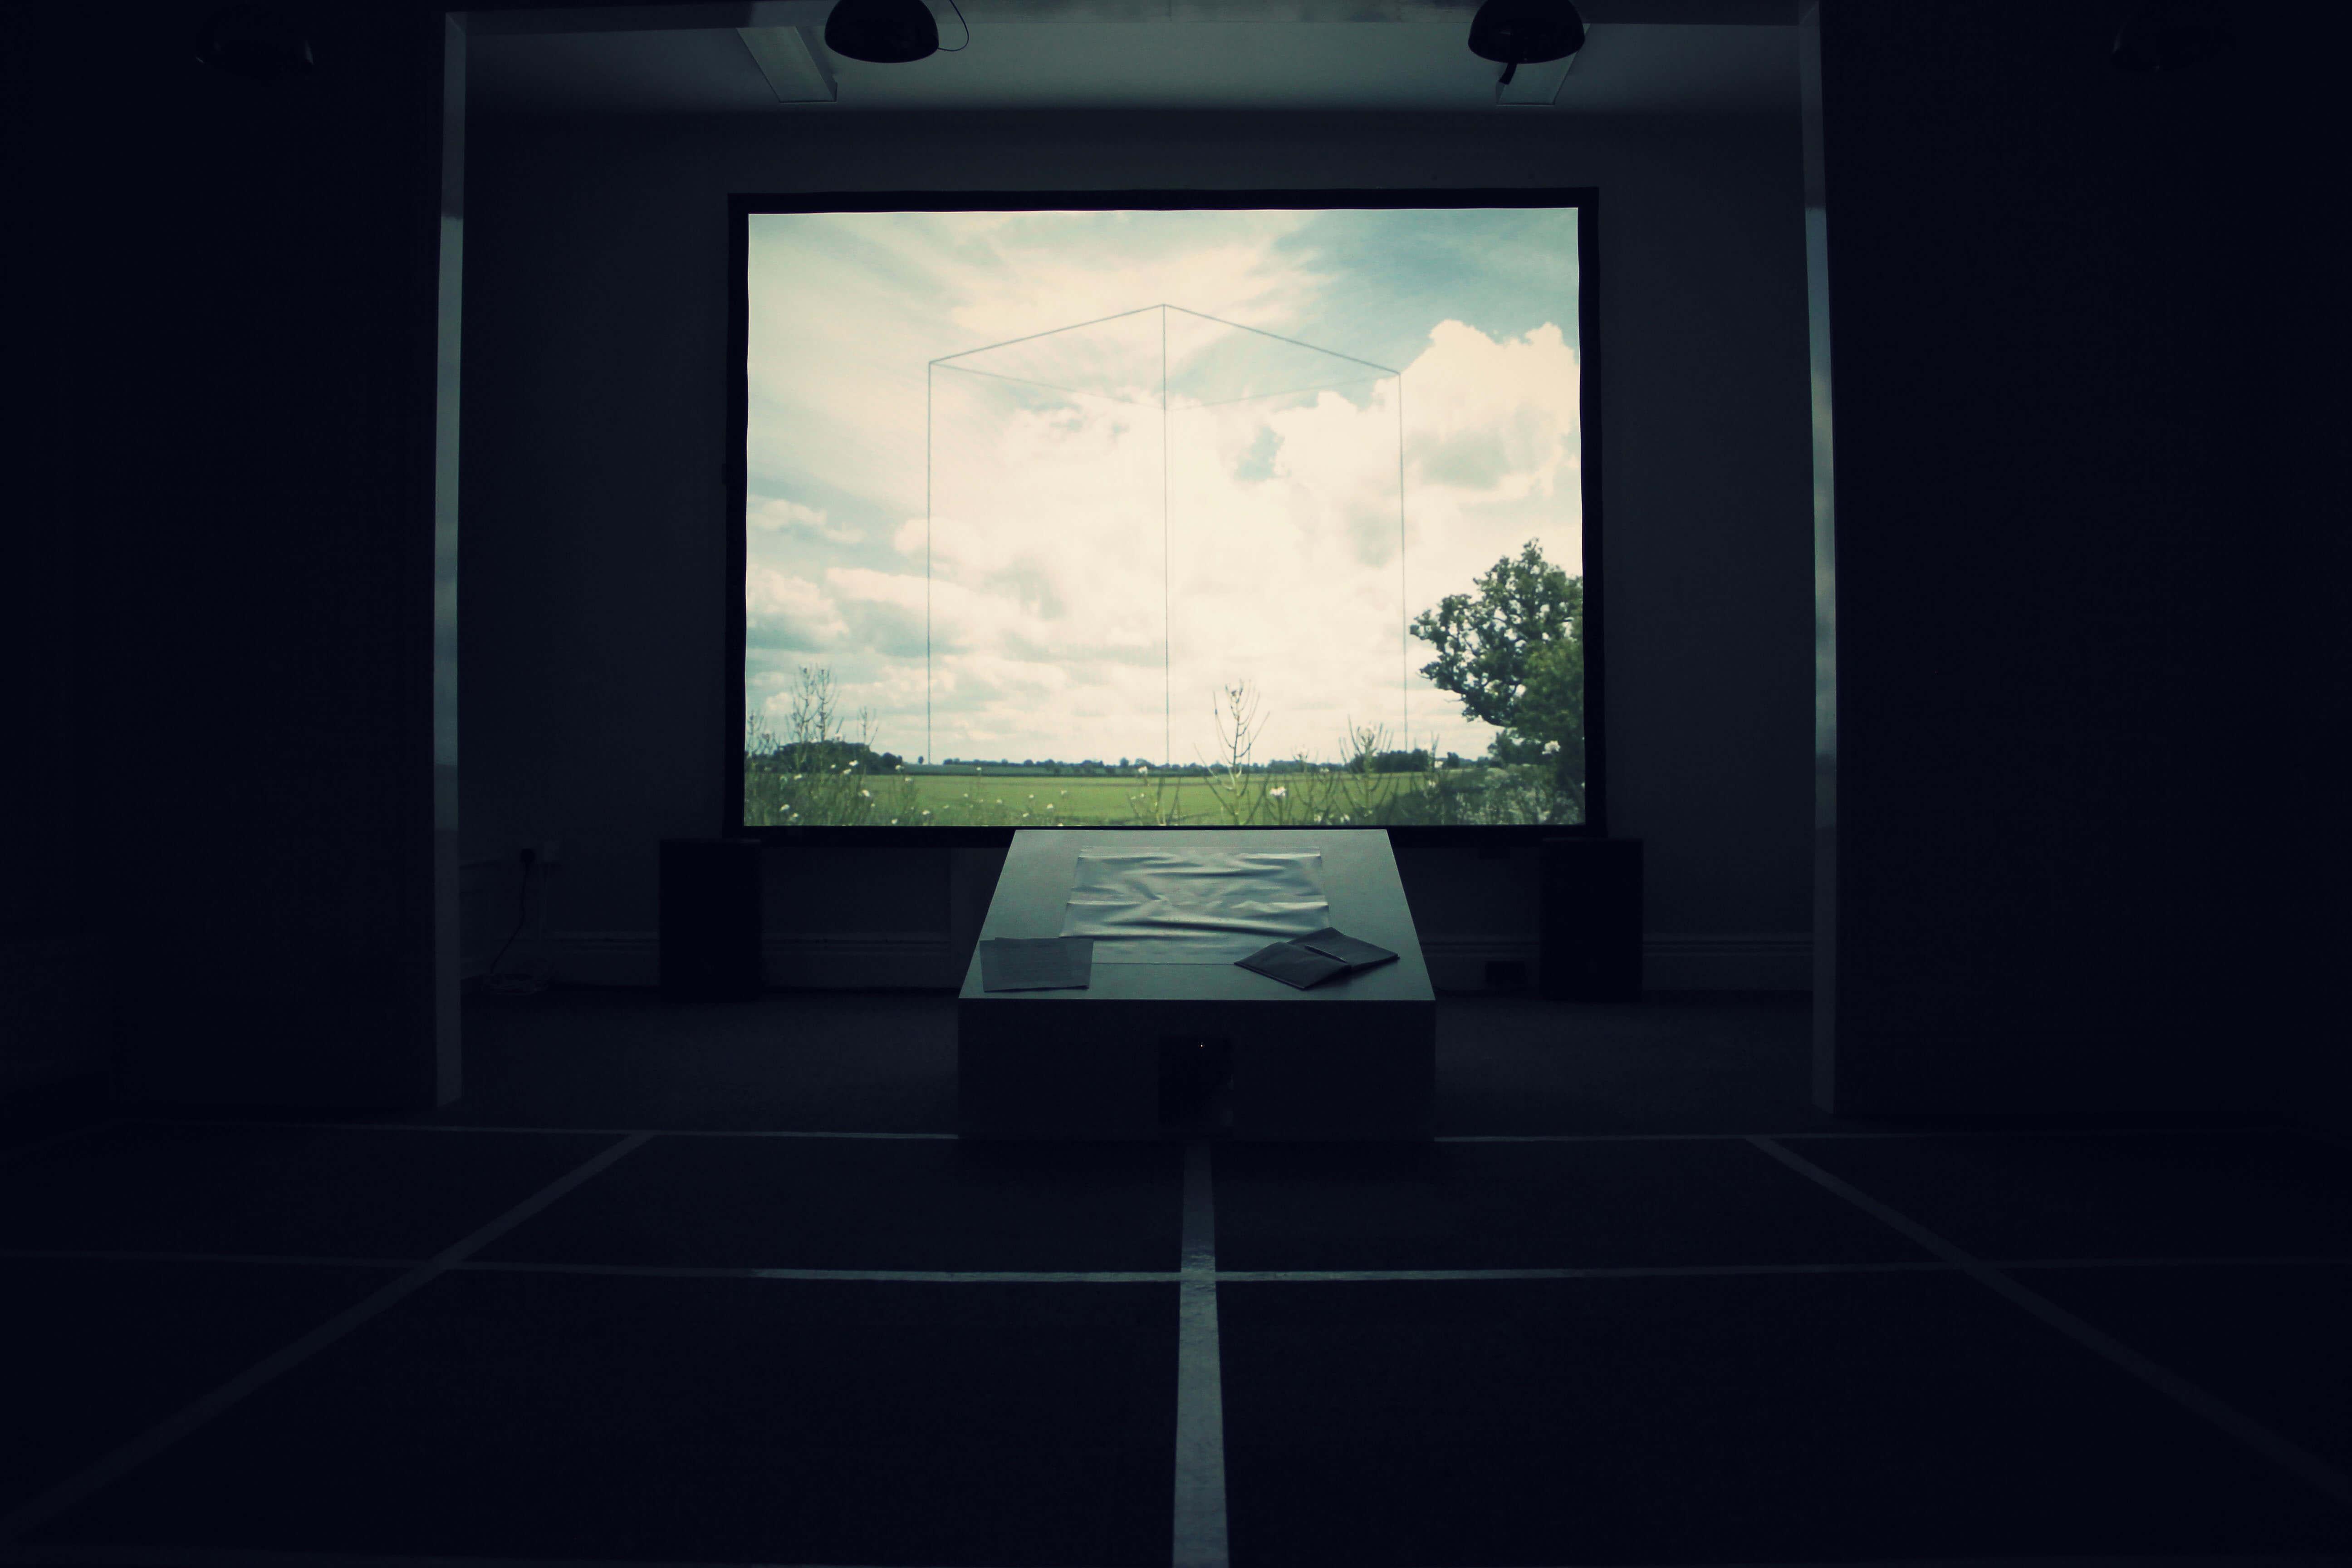 Project Skycube, Joanna White. Photo: Benjamin Kidd